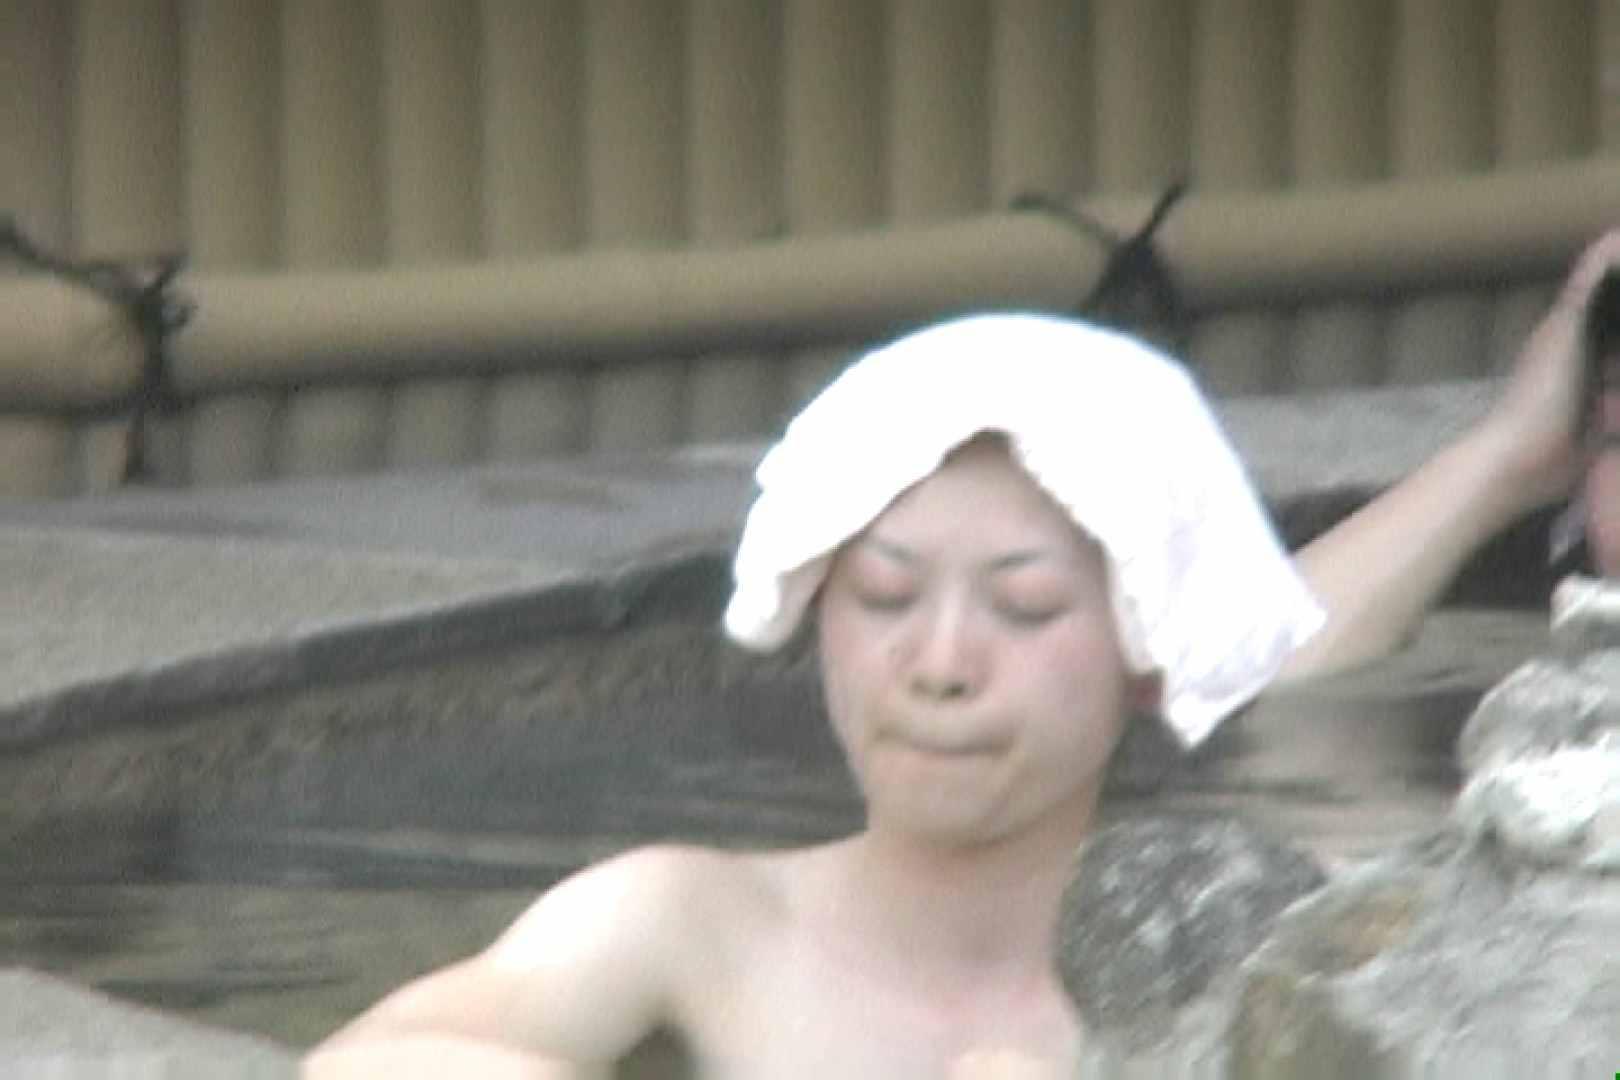 Aquaな露天風呂Vol.693 露天風呂編 | 盗撮シリーズ  105PIX 45